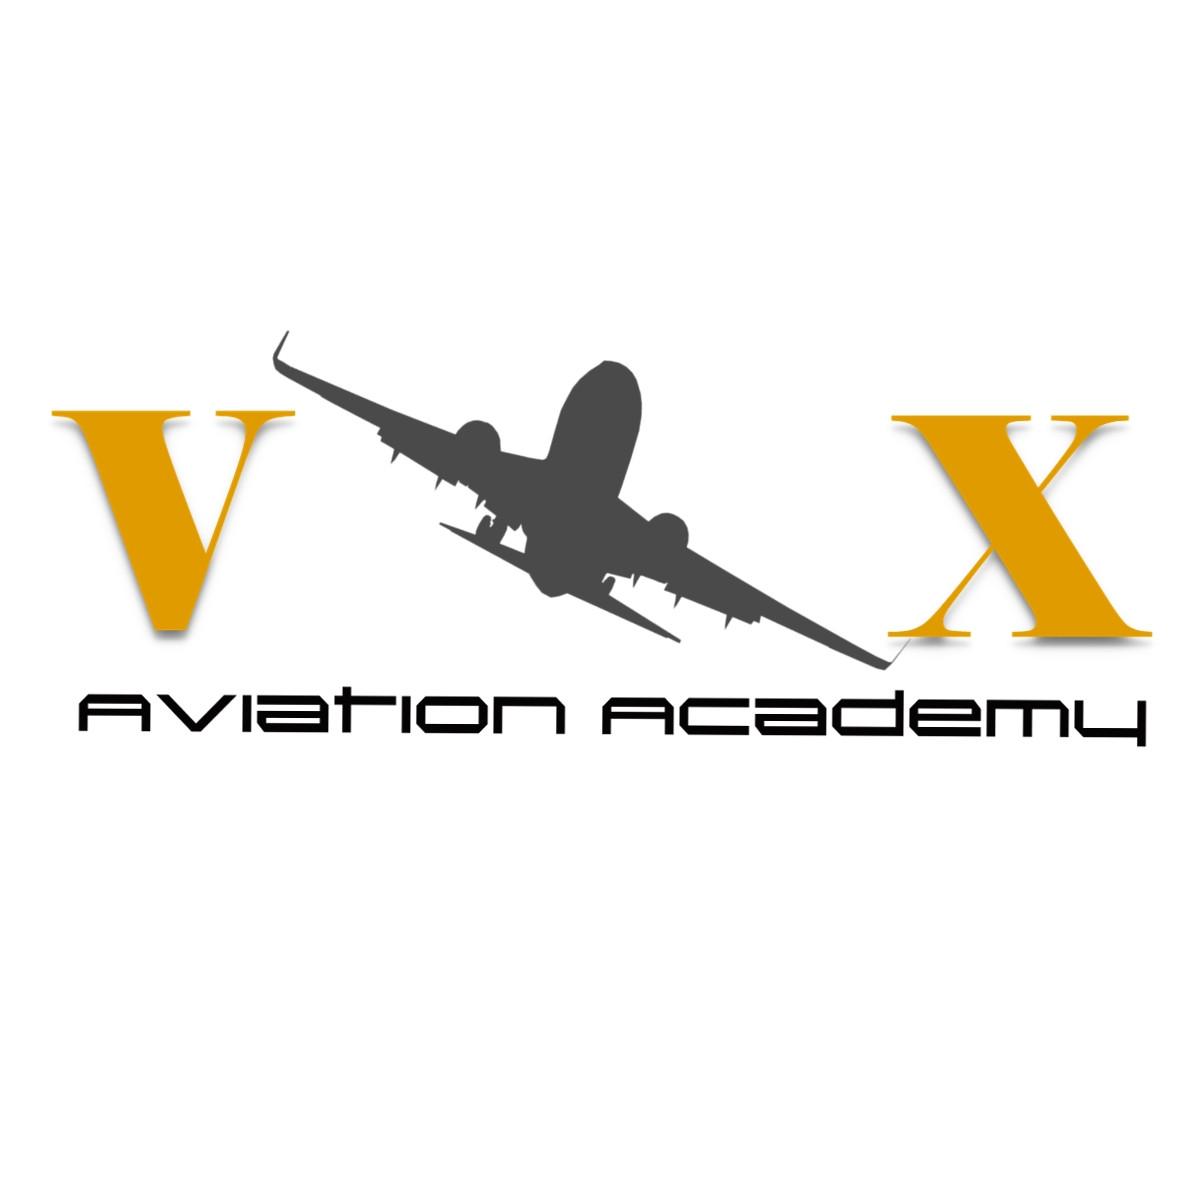 Mantenimiento Aeronáutico Programas